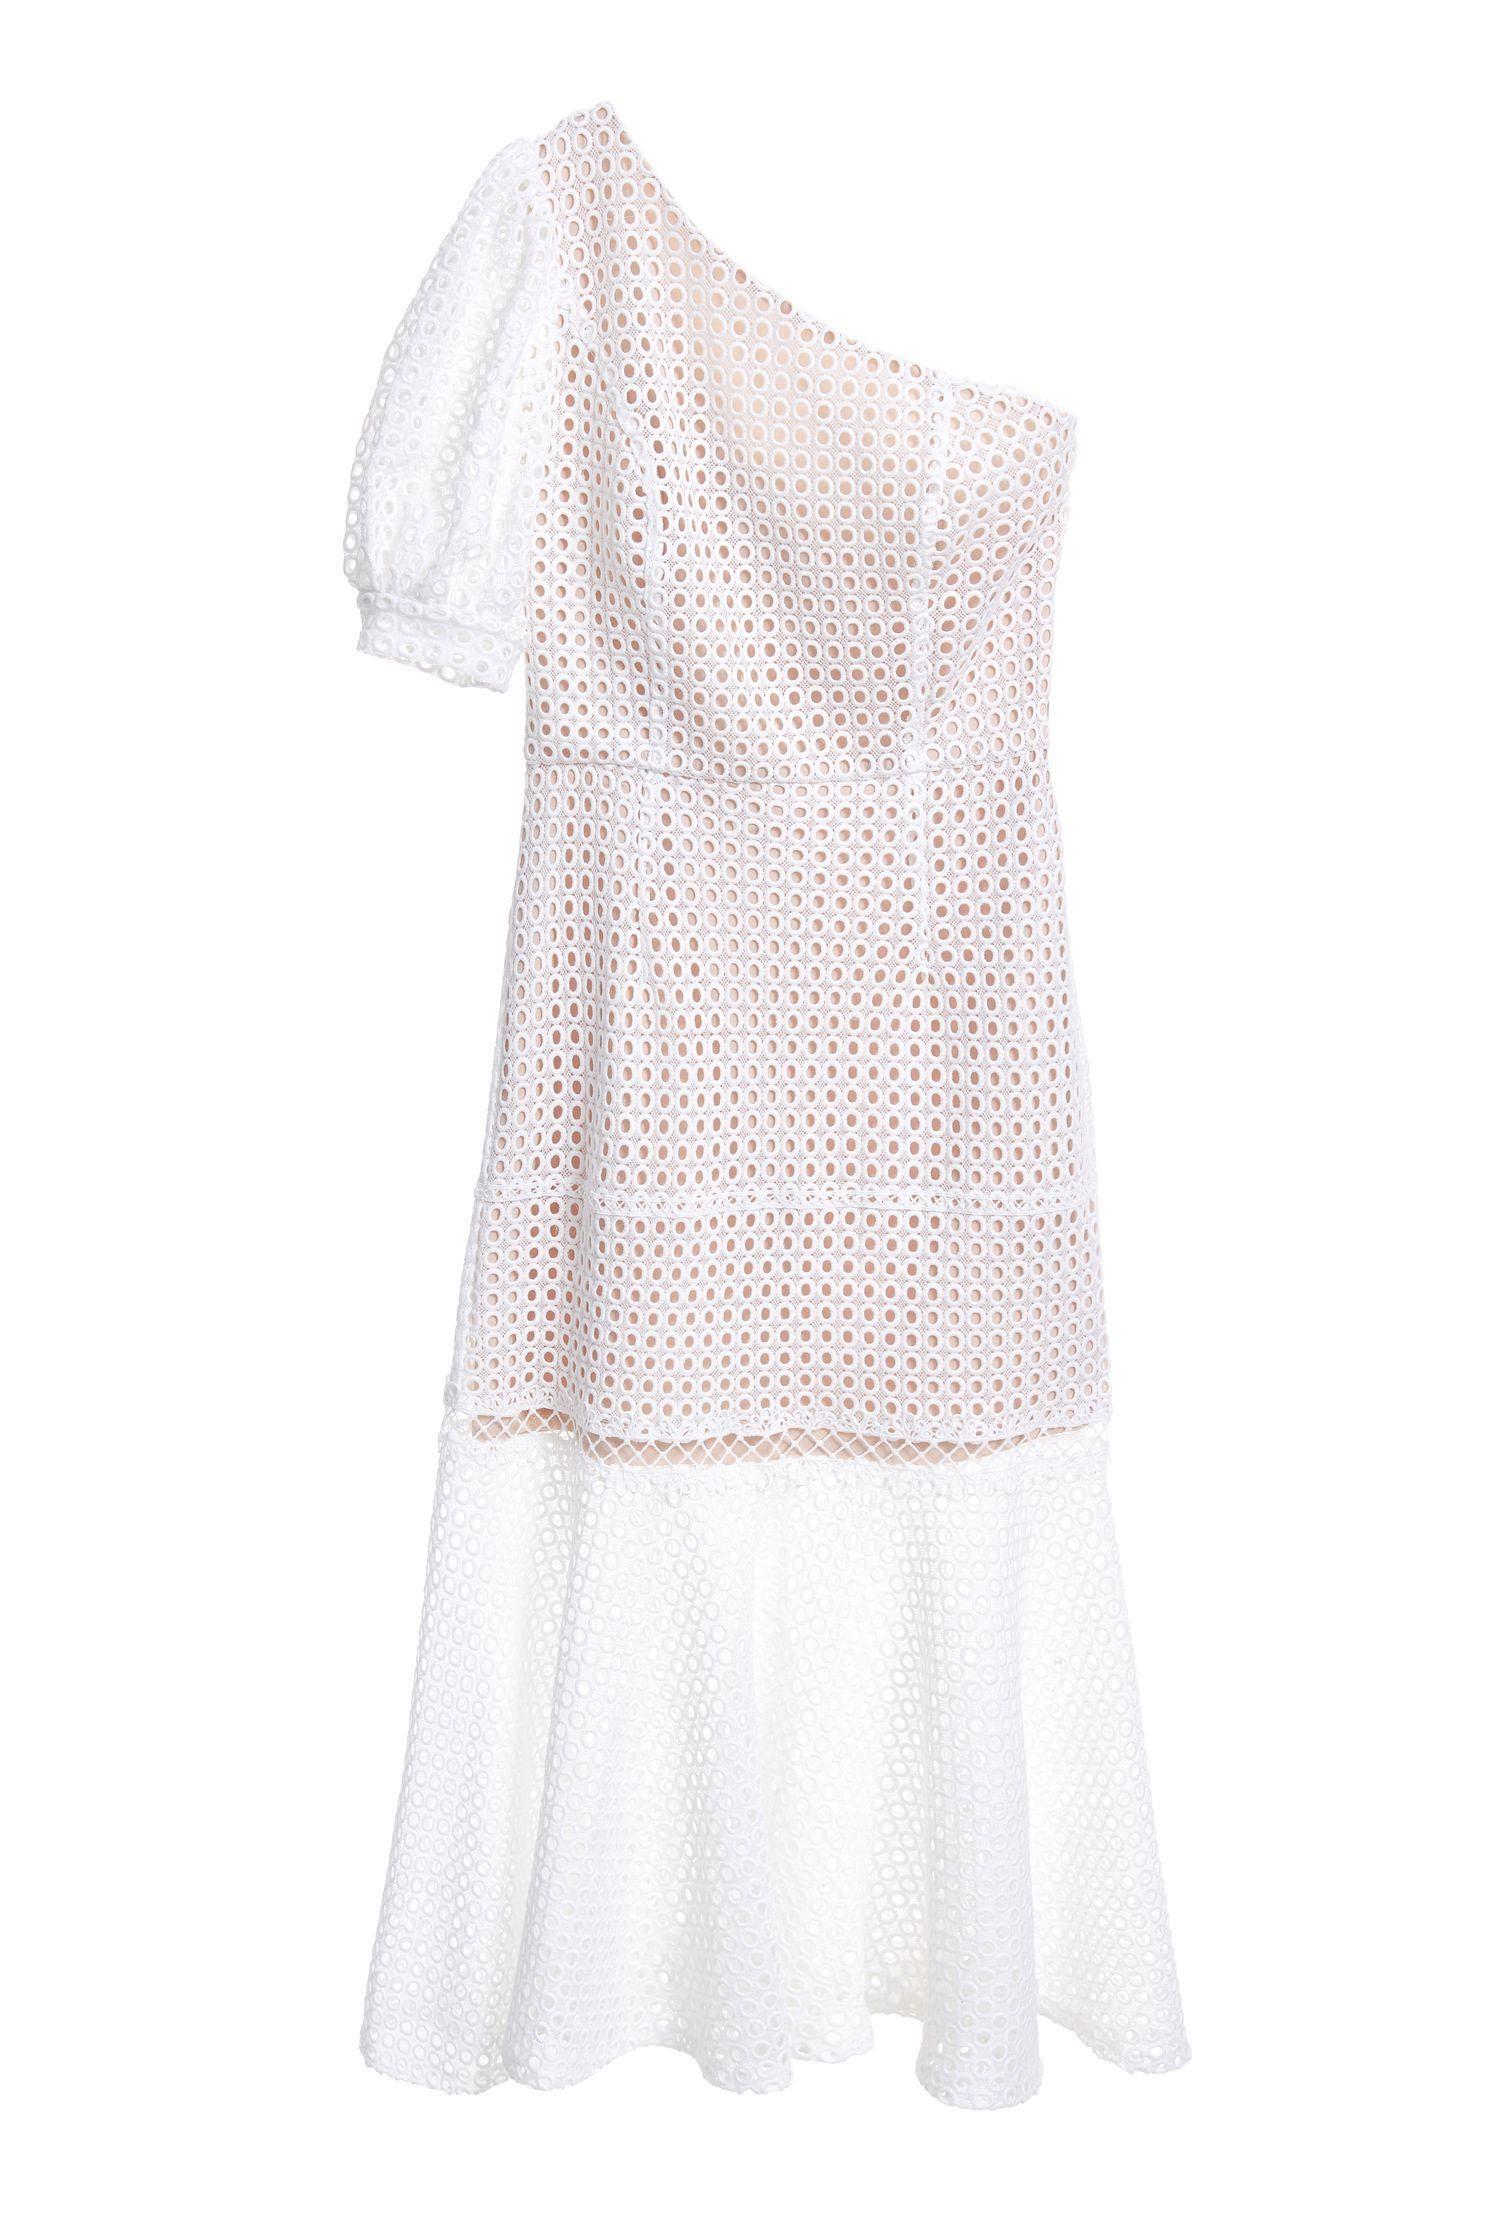 Net hole one-shoulder fishtail dress,dress,onlinelimitededition,longdress